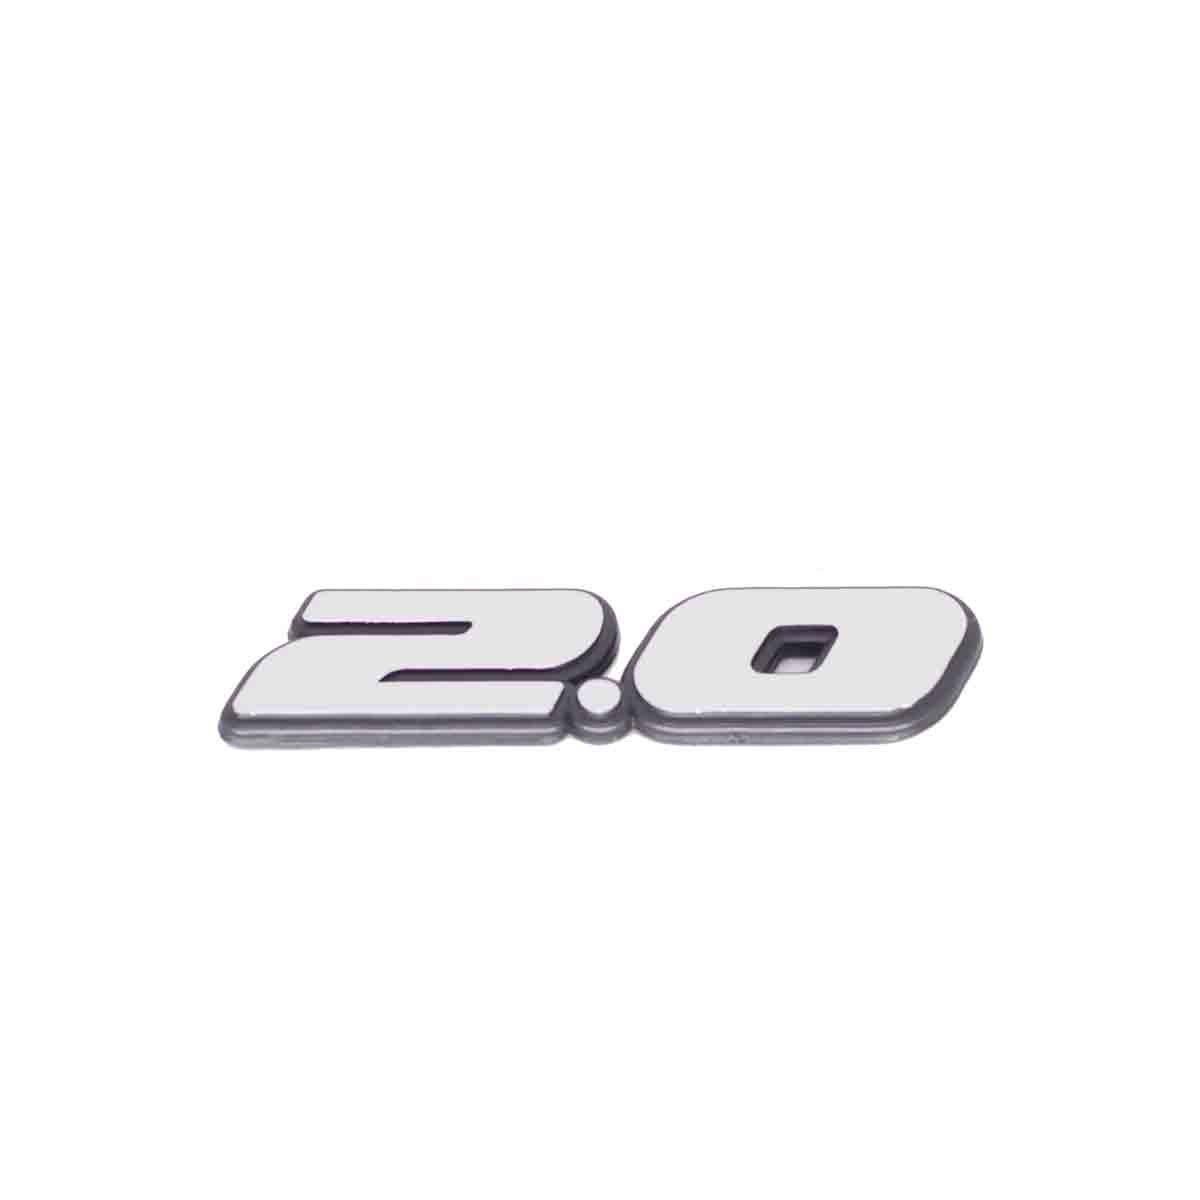 Emblema 2.0 Gol / Voyage / Parati / Saveiro / Todos 91/95